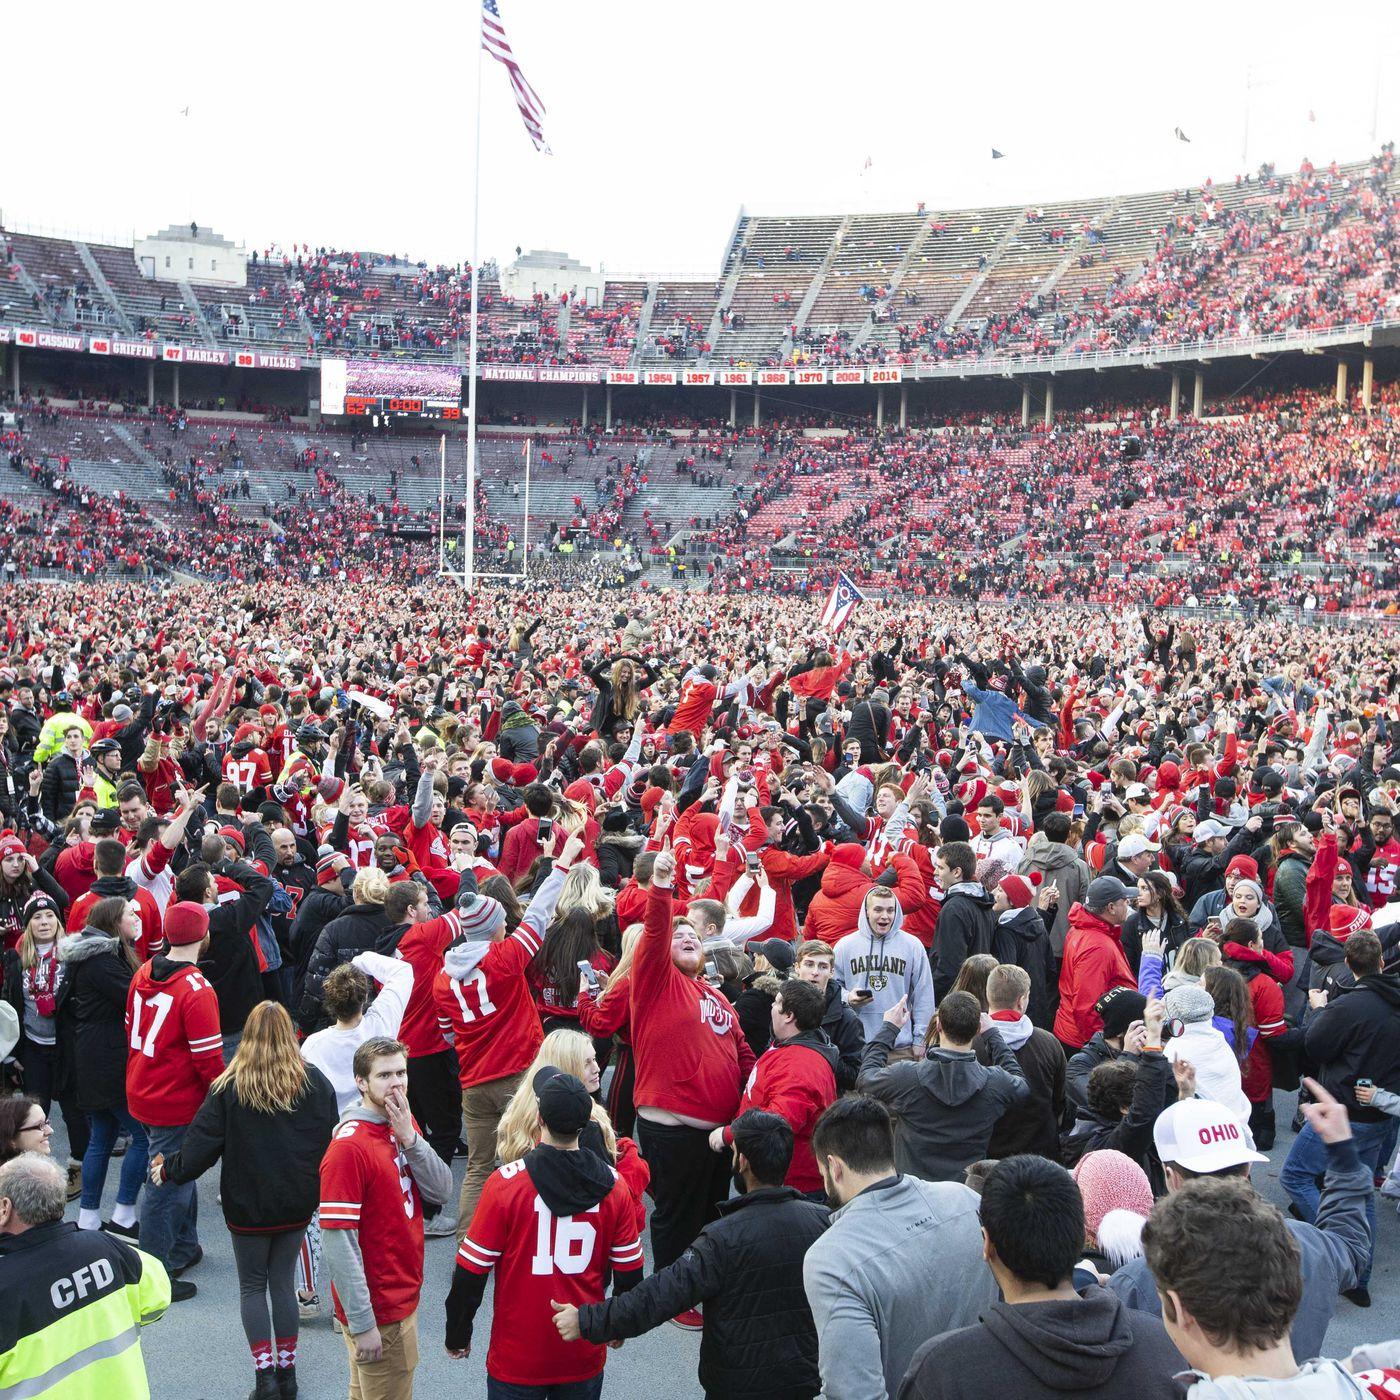 6a9d73f3bb6 Ohio State had third highest average home football attendance last season -  Land-Grant Holy Land